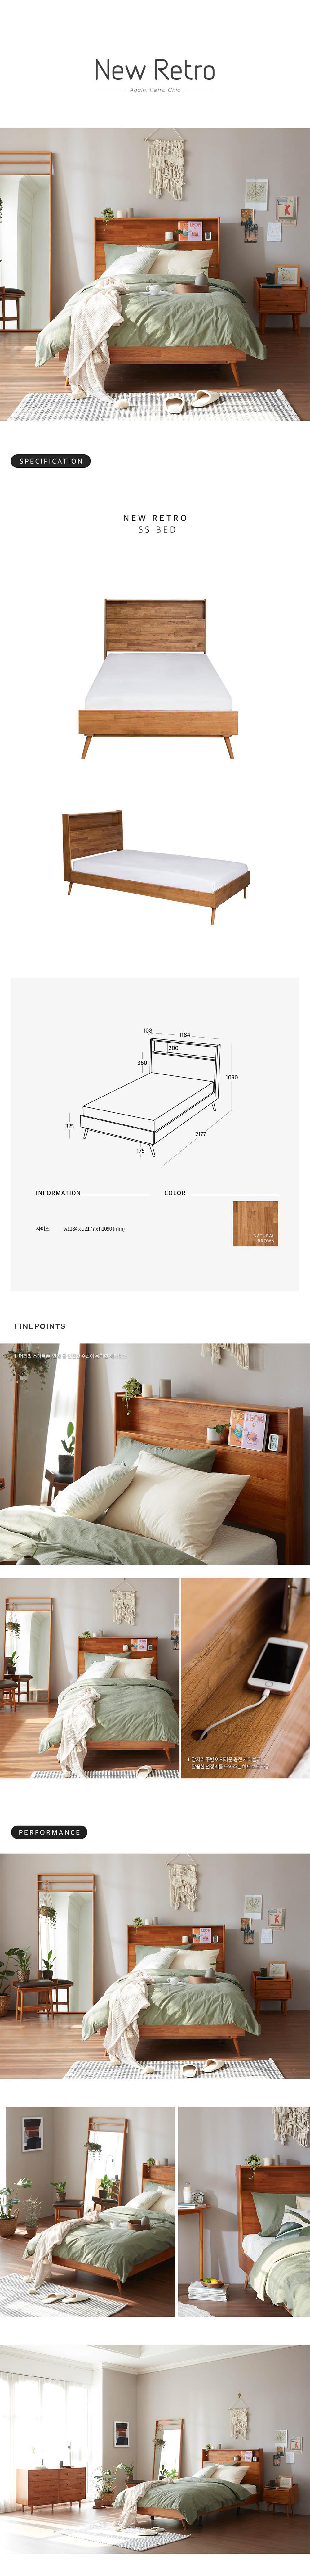 New_Retro_Super_Single_Bed_Frame_2m_specs_by_born_in_colour